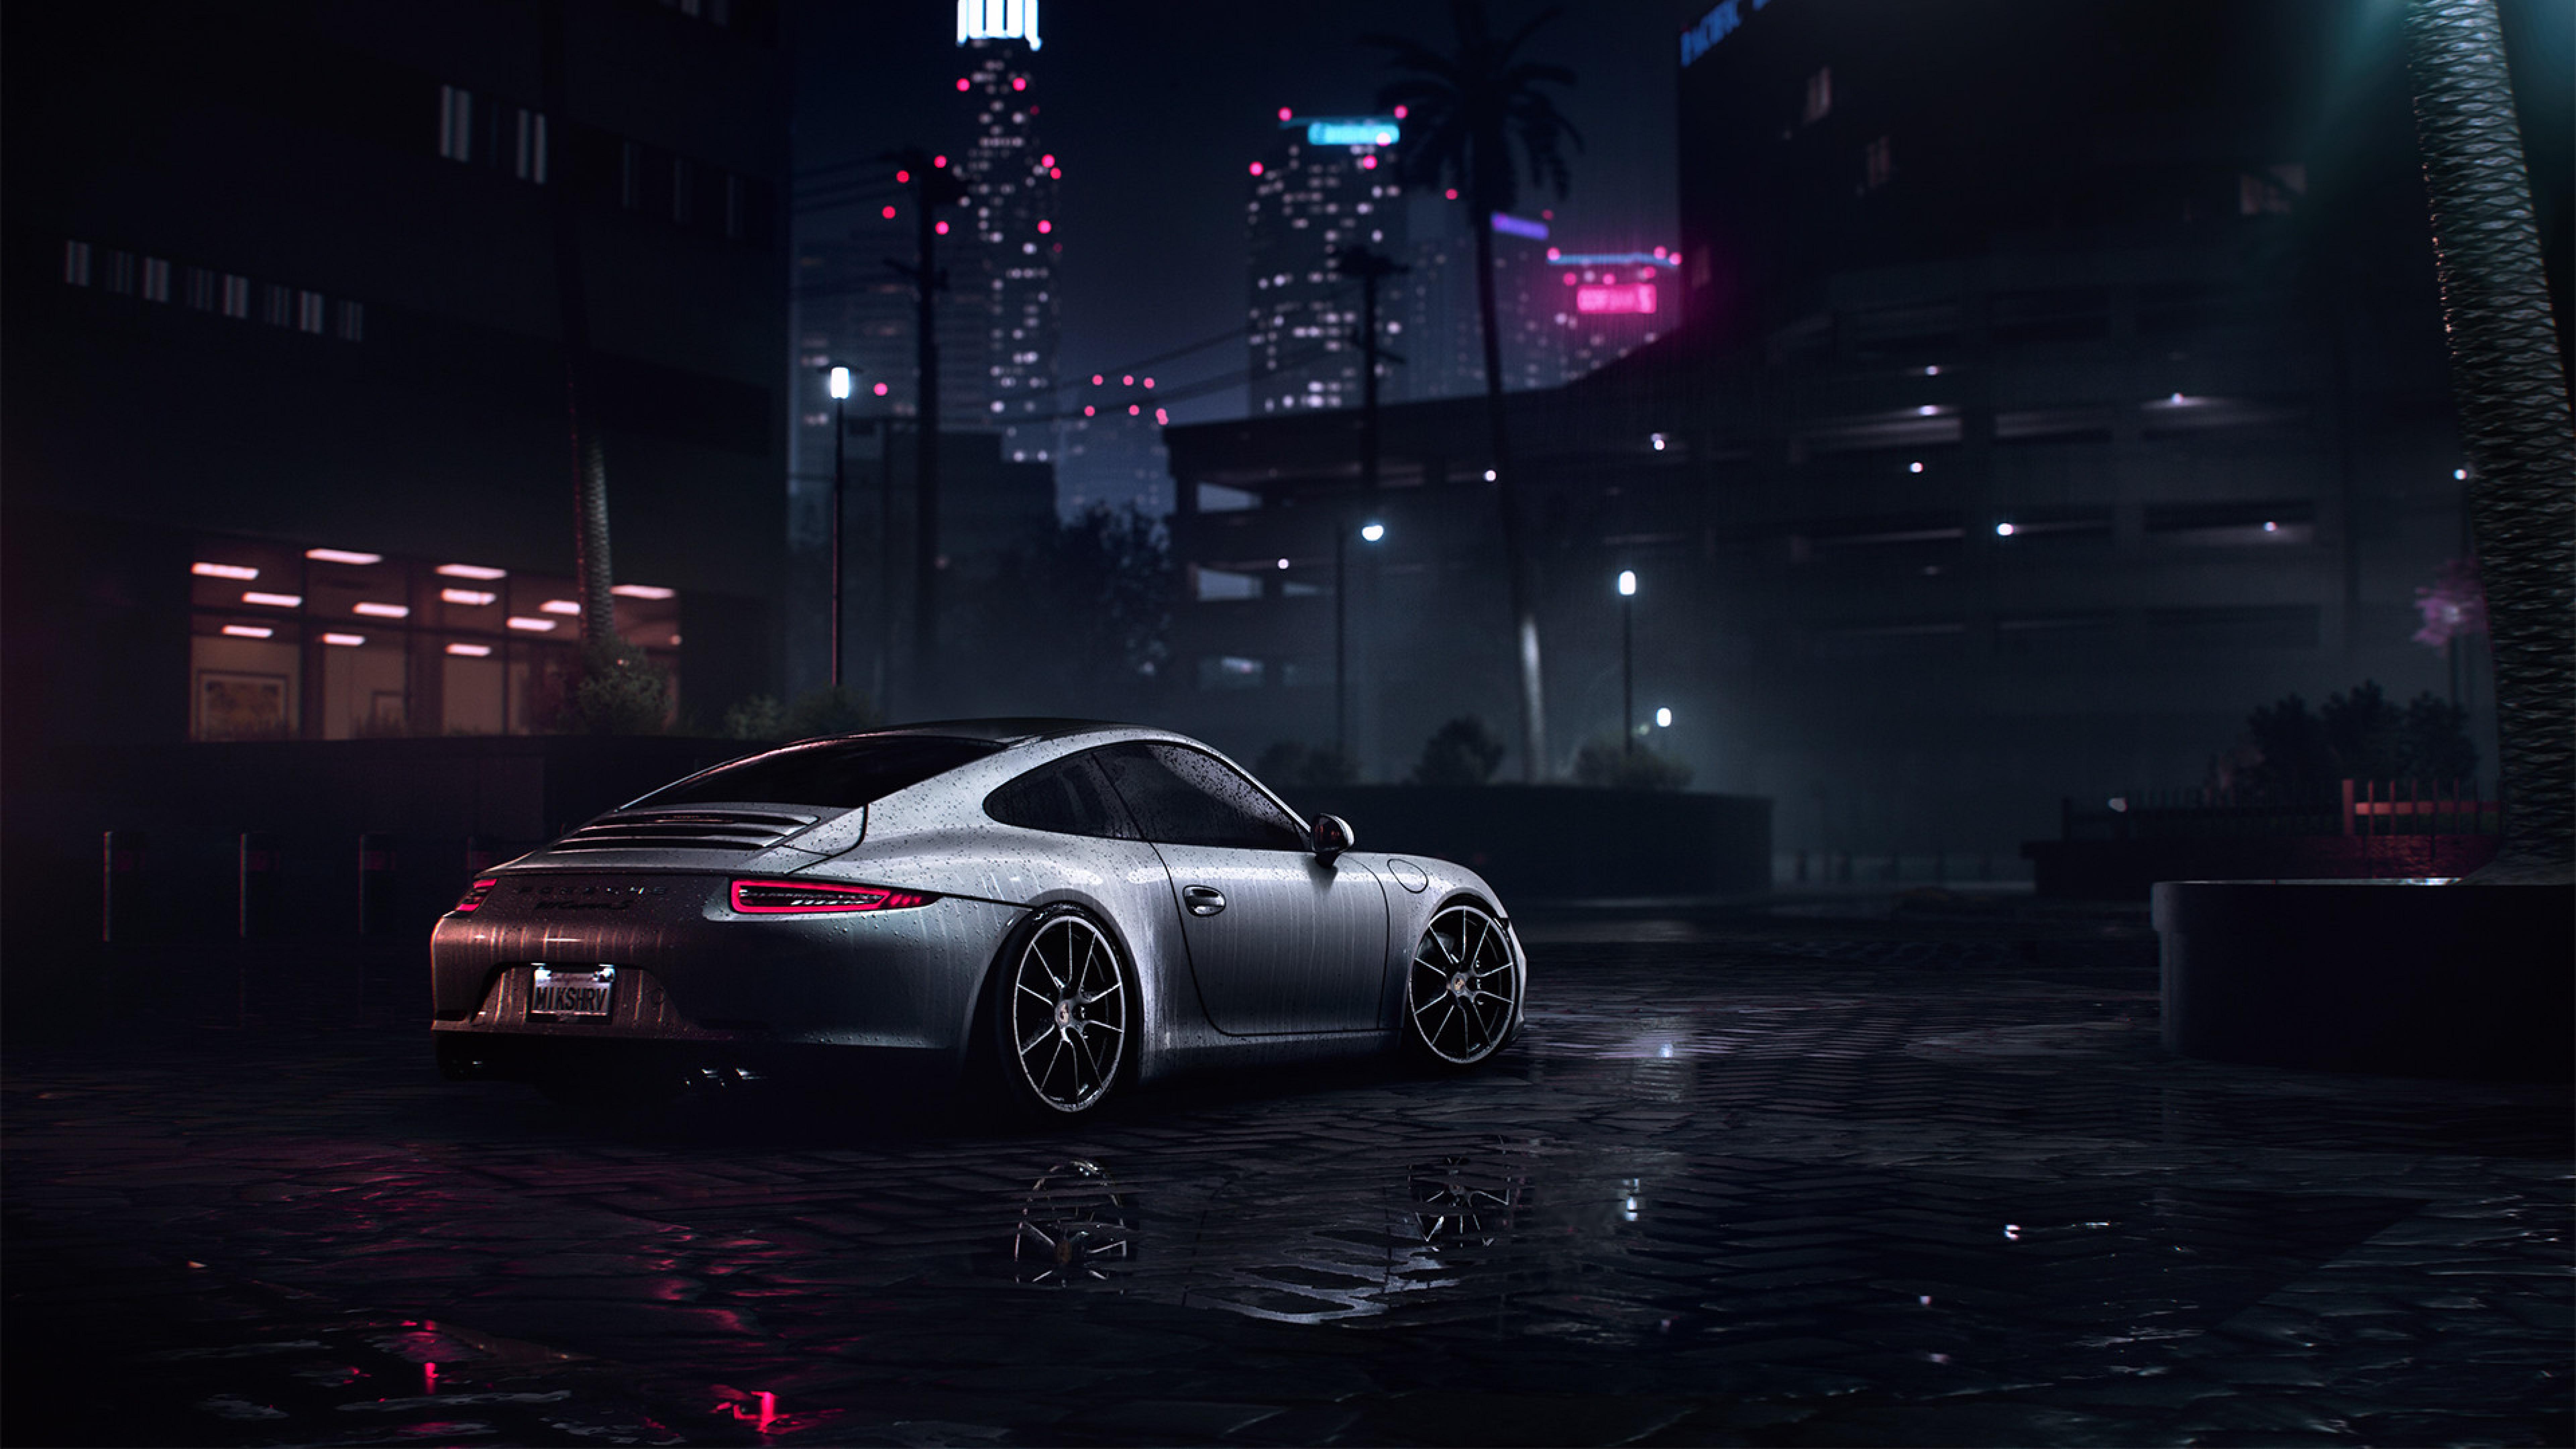 7680x4320 Porsche 911 Carrera S Need For Speed 8K ...